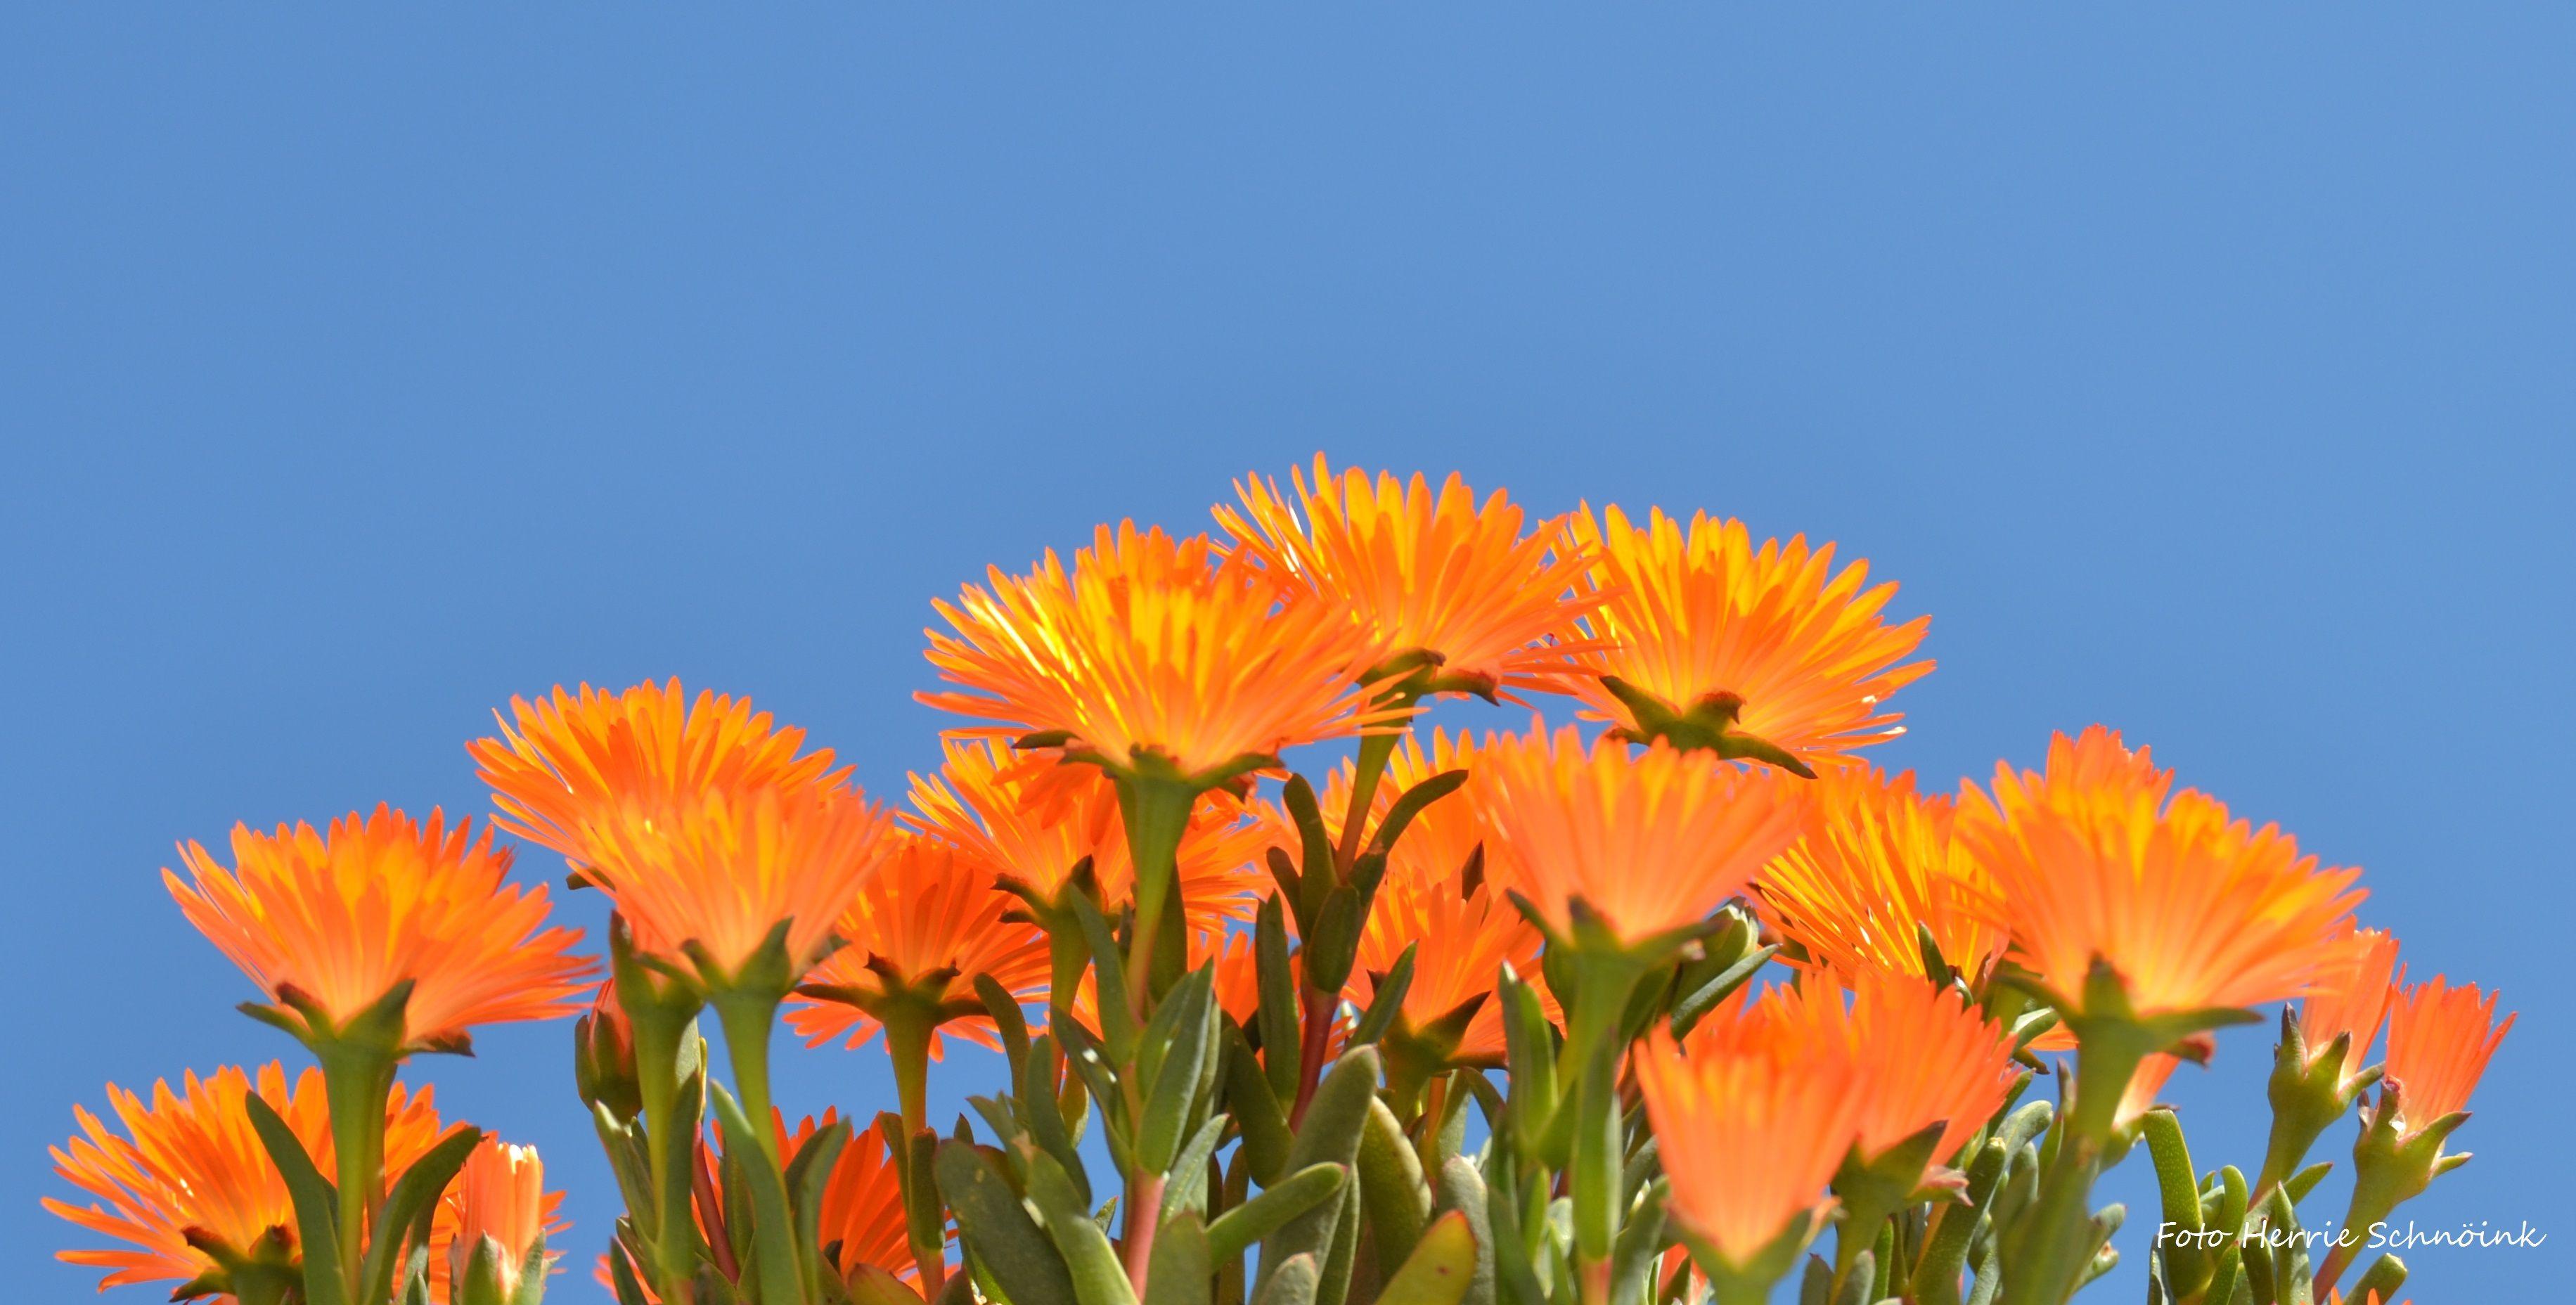 Marigold against a bright blue sky